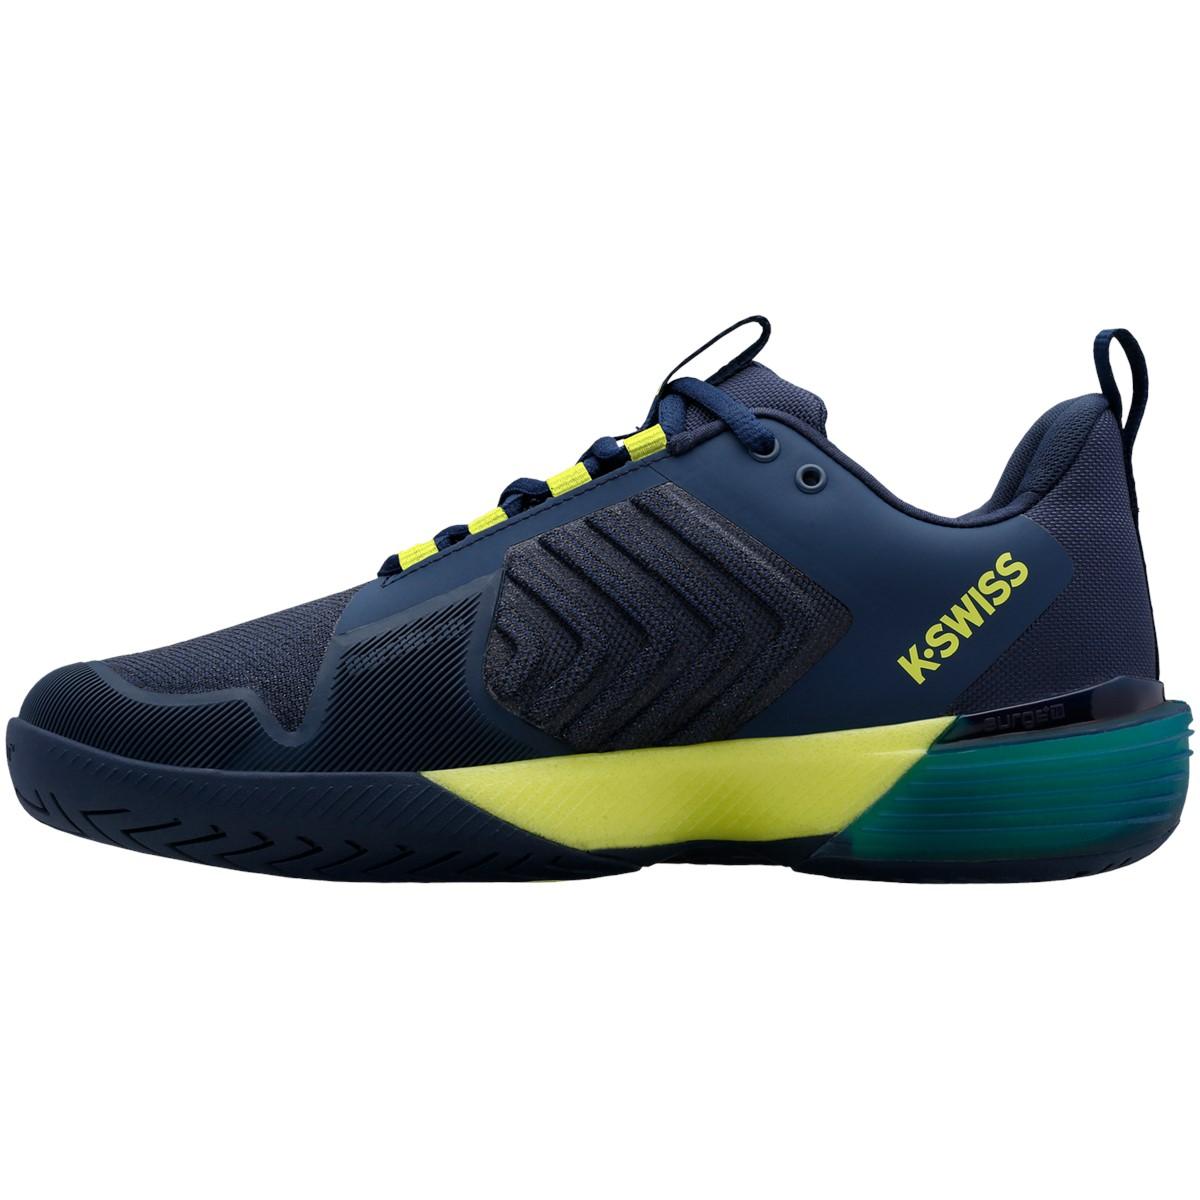 K-Swiss Ultrashot 3 Mens Tennis Shoes – Moonlit Ocean/Love Bird